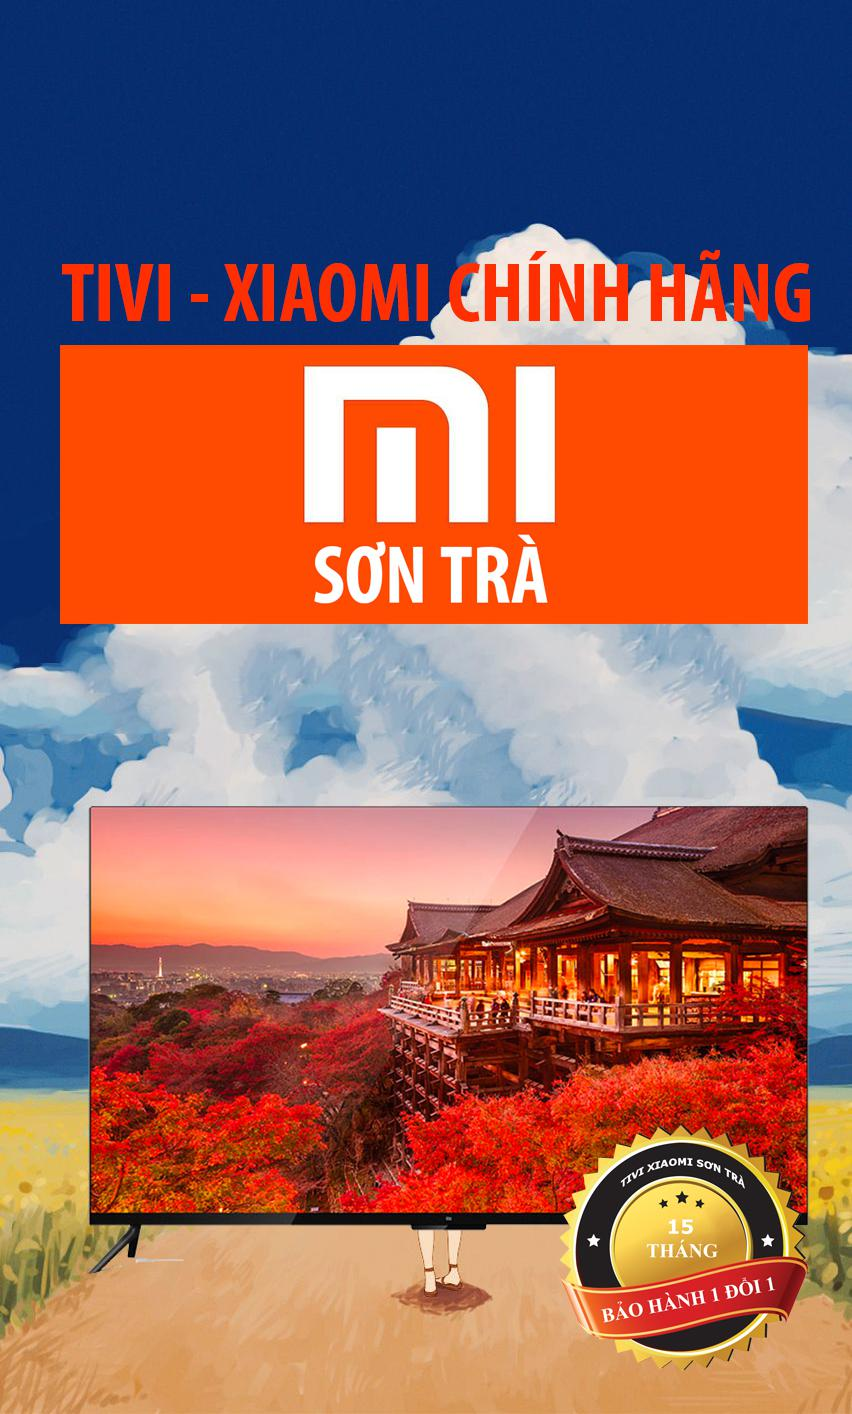 Phụ kiện tivi Xiaomi